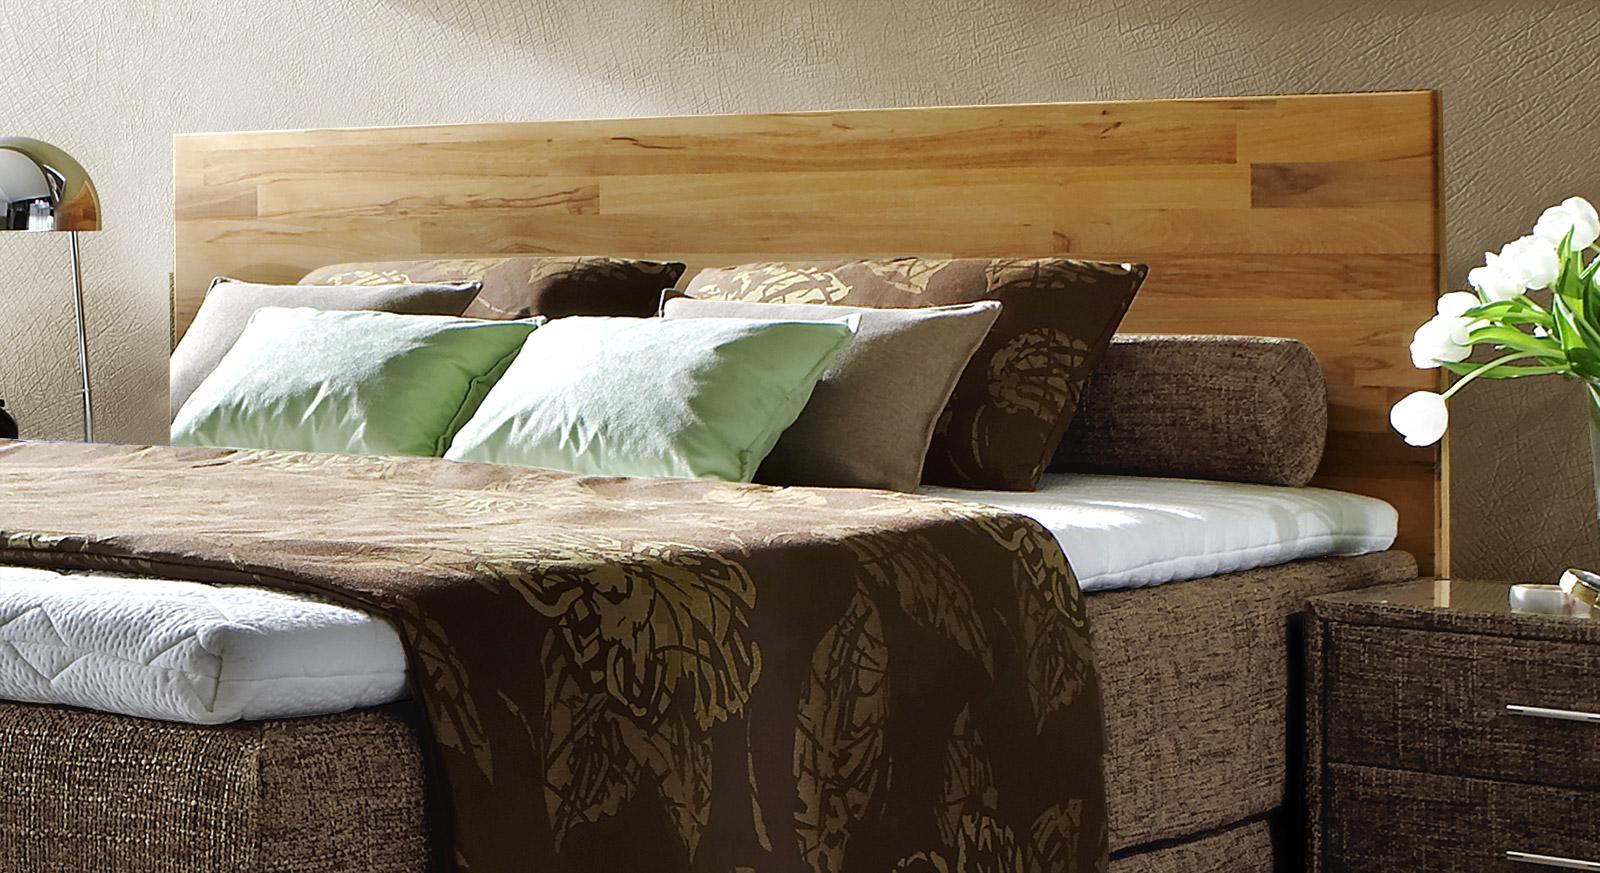 massivholz boxspringbett salvatore online bei kaufen. Black Bedroom Furniture Sets. Home Design Ideas